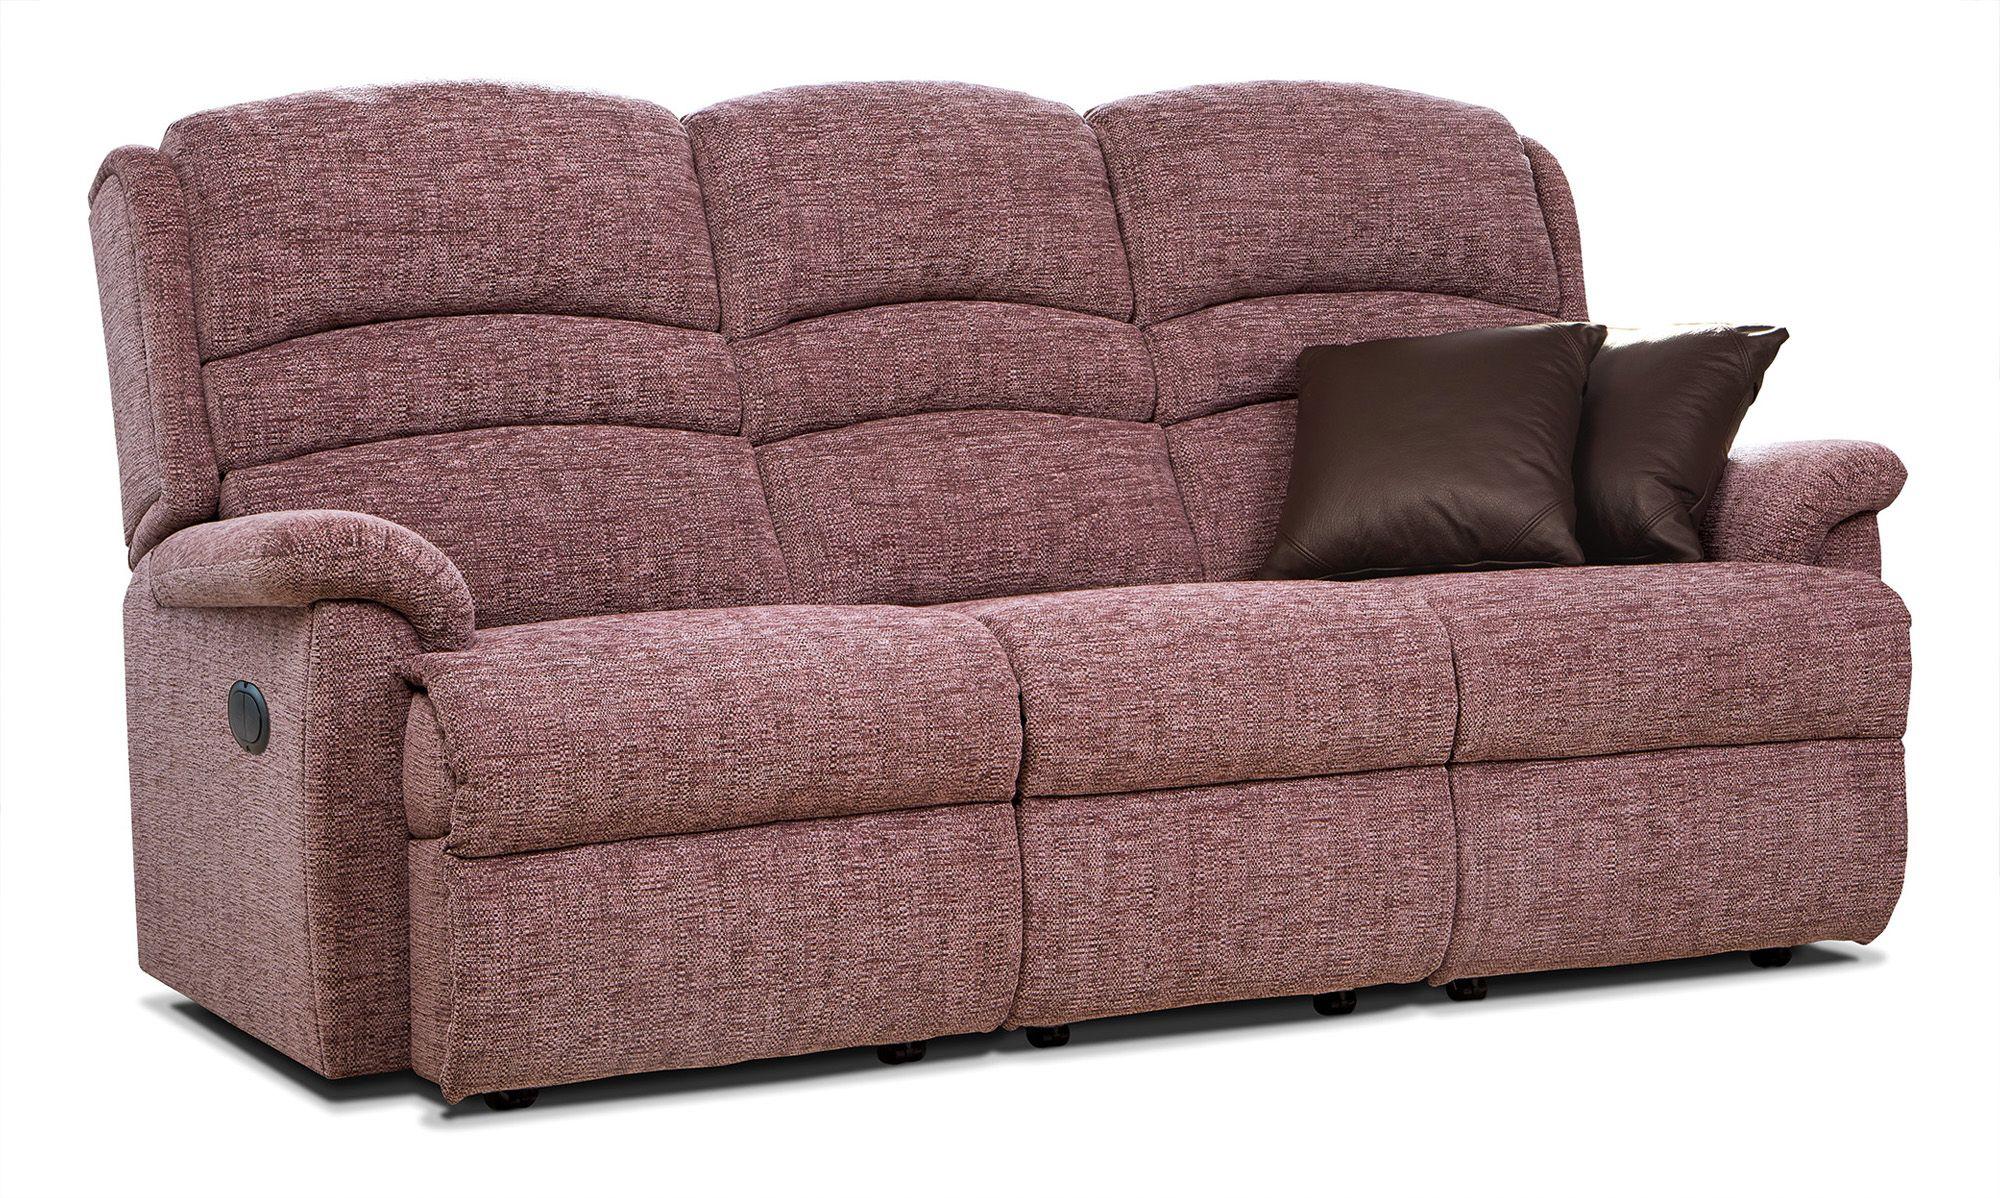 Ottomans Sherborne Ottoman Large: Sherborne Upholstery Sherborne Olivia Reclining 3 Seater